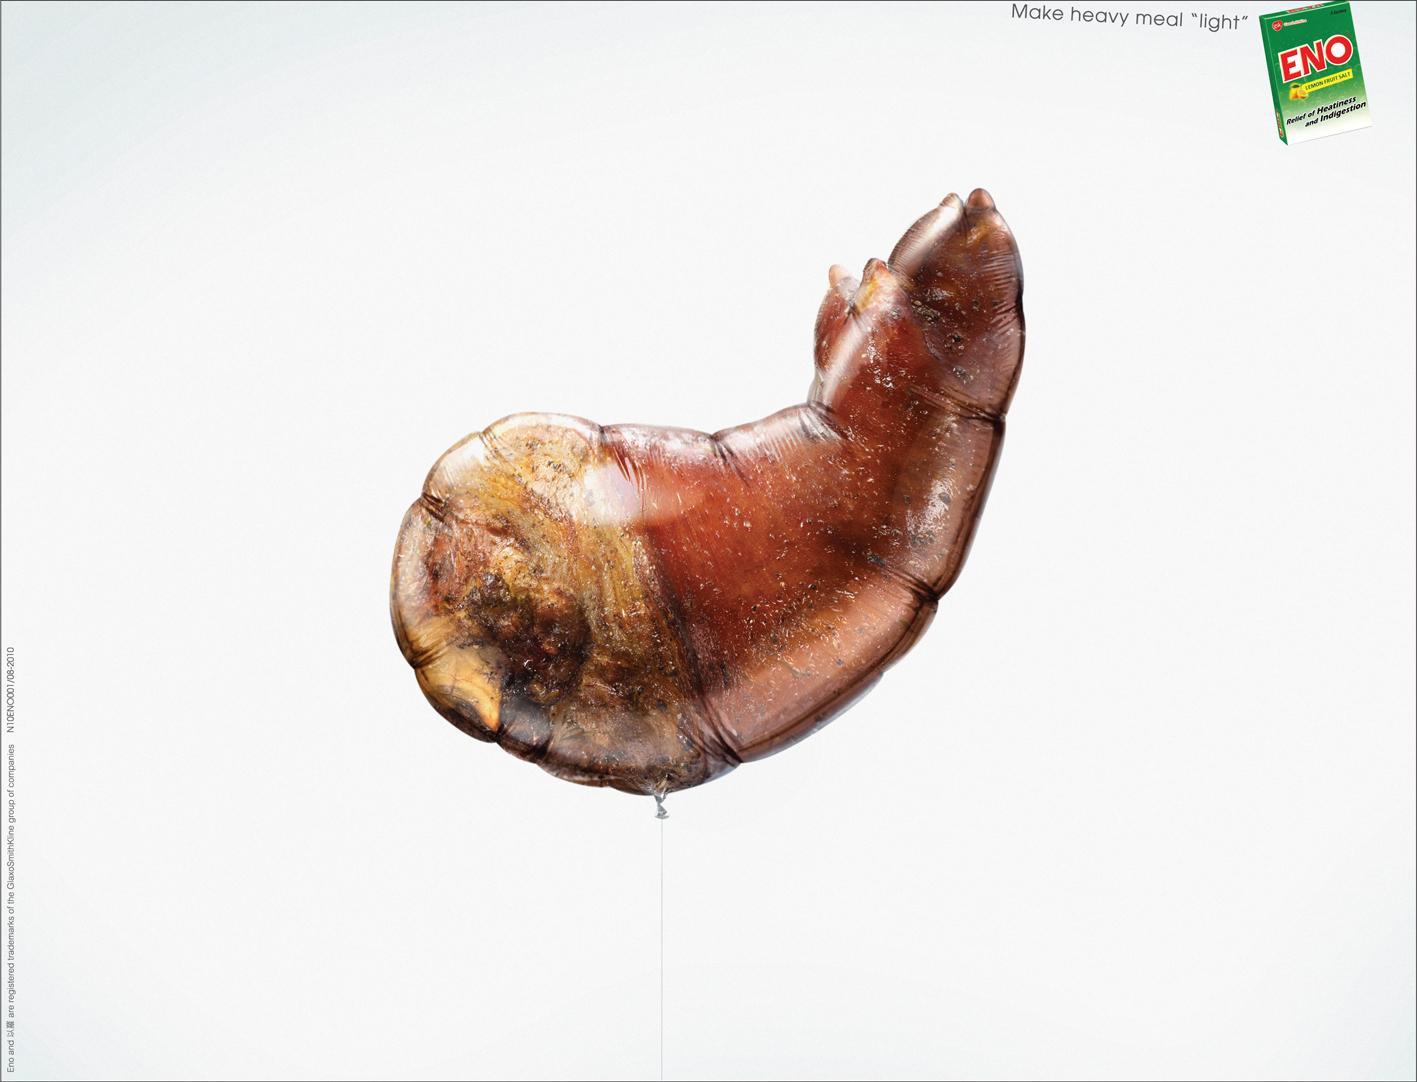 Eno Print Ad -  Food Balloon, Pig Knuckle